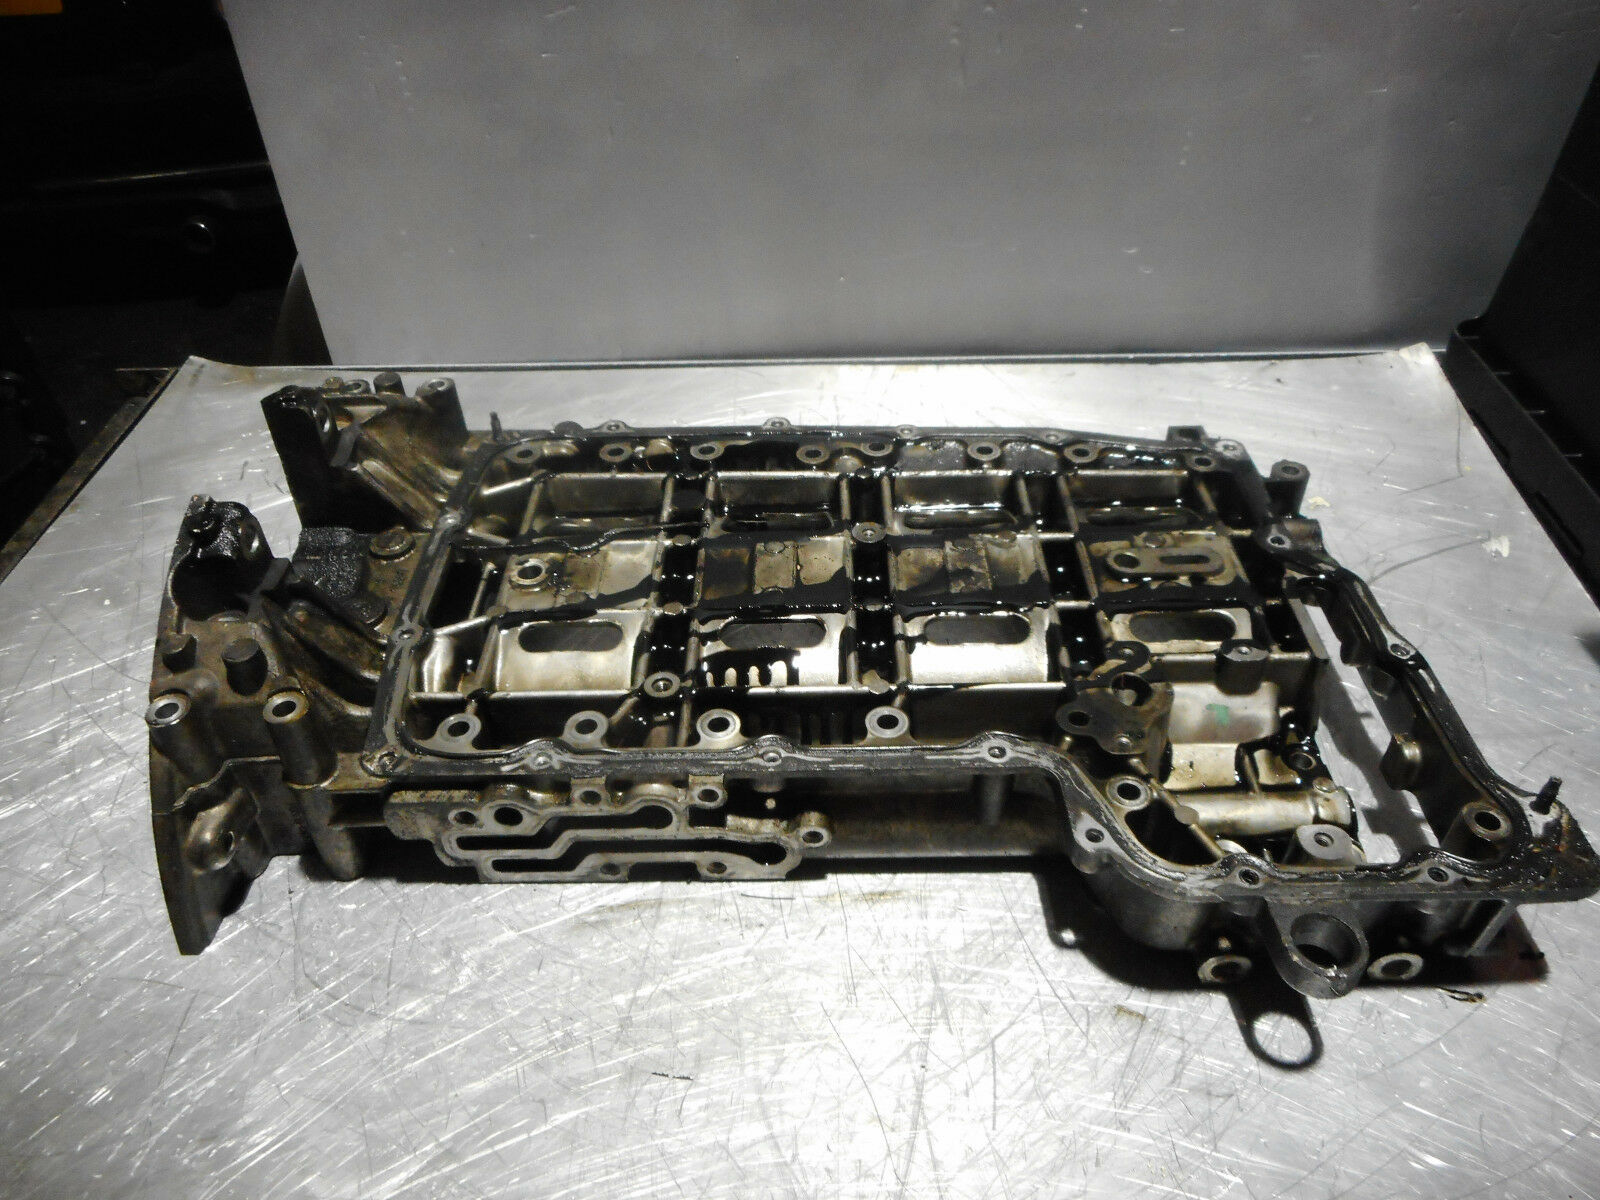 Ford Ranger 3.2 20 V Diesel Inférieur Tin Sump 2012-2016 BB3Q6675B2B